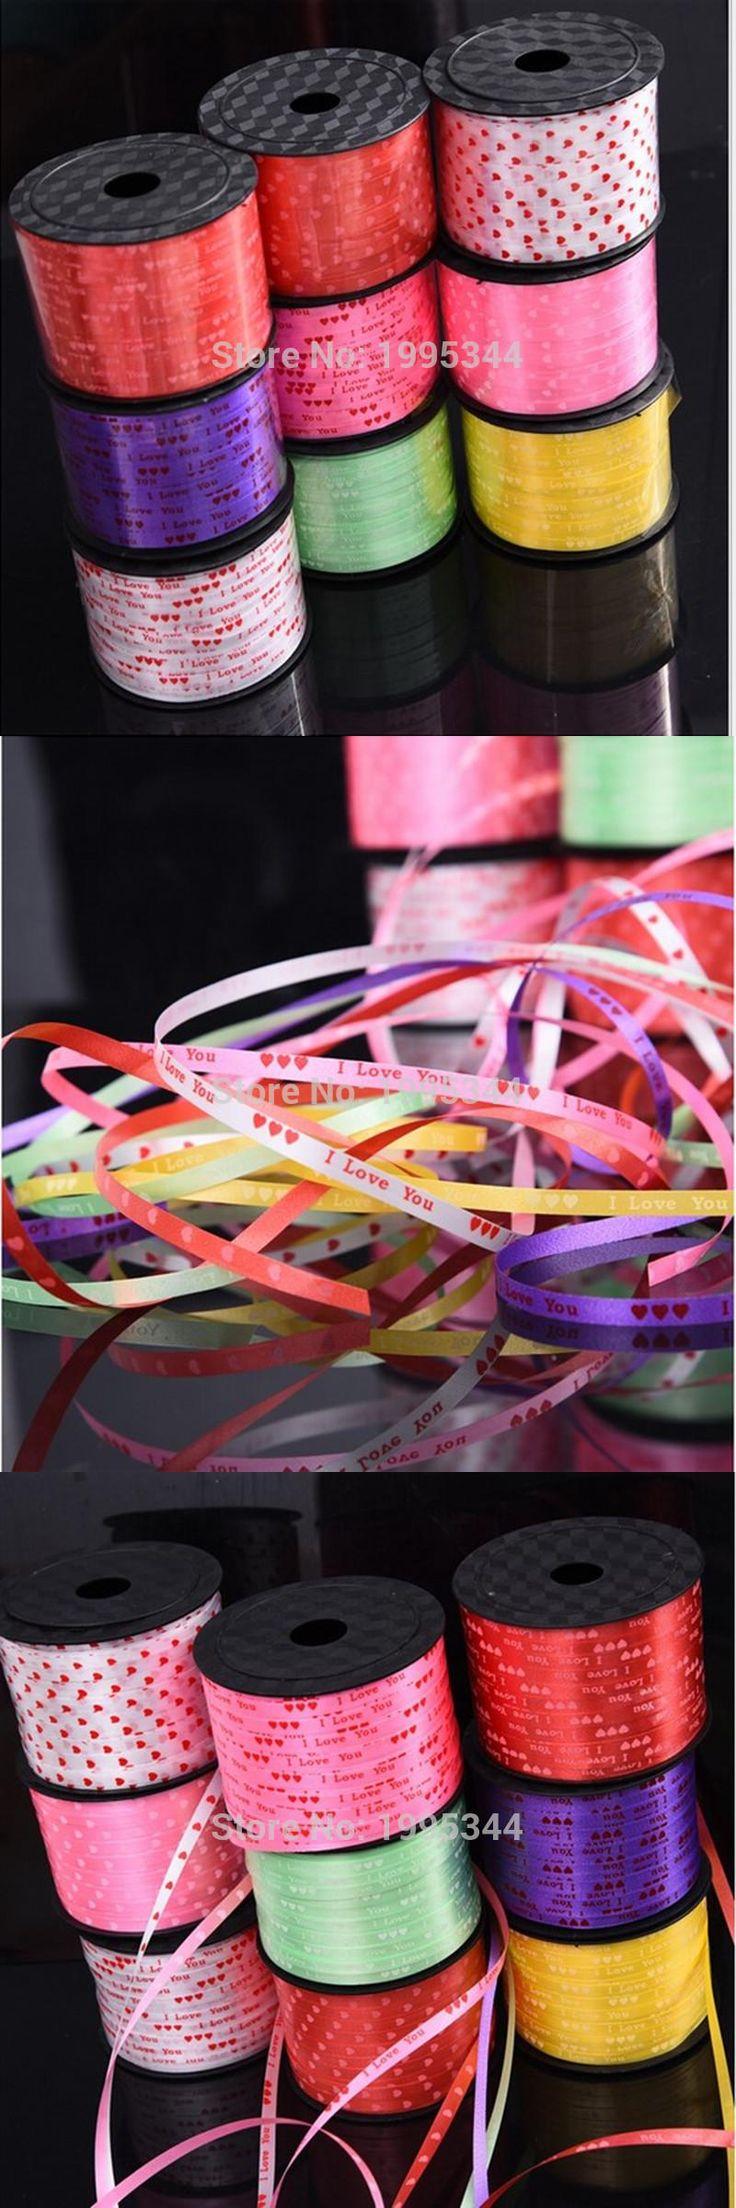 [Visit to Buy] 100 yards printing wedding celebration Ribbon floating air balloon hydrogen helium balloon rope tying Gift box free shipping #Advertisement